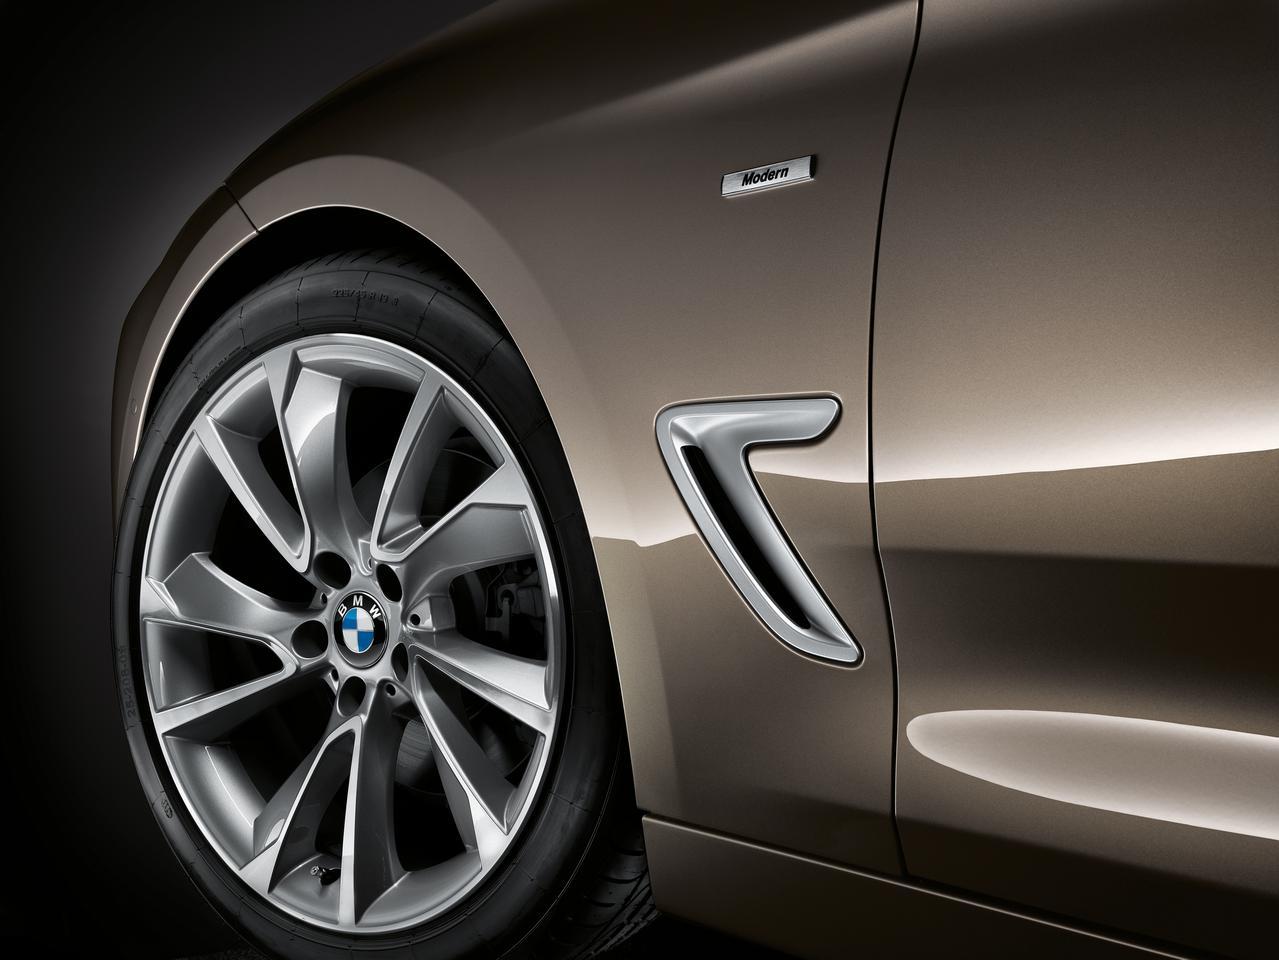 The BMW 3 Series Gran Turismo